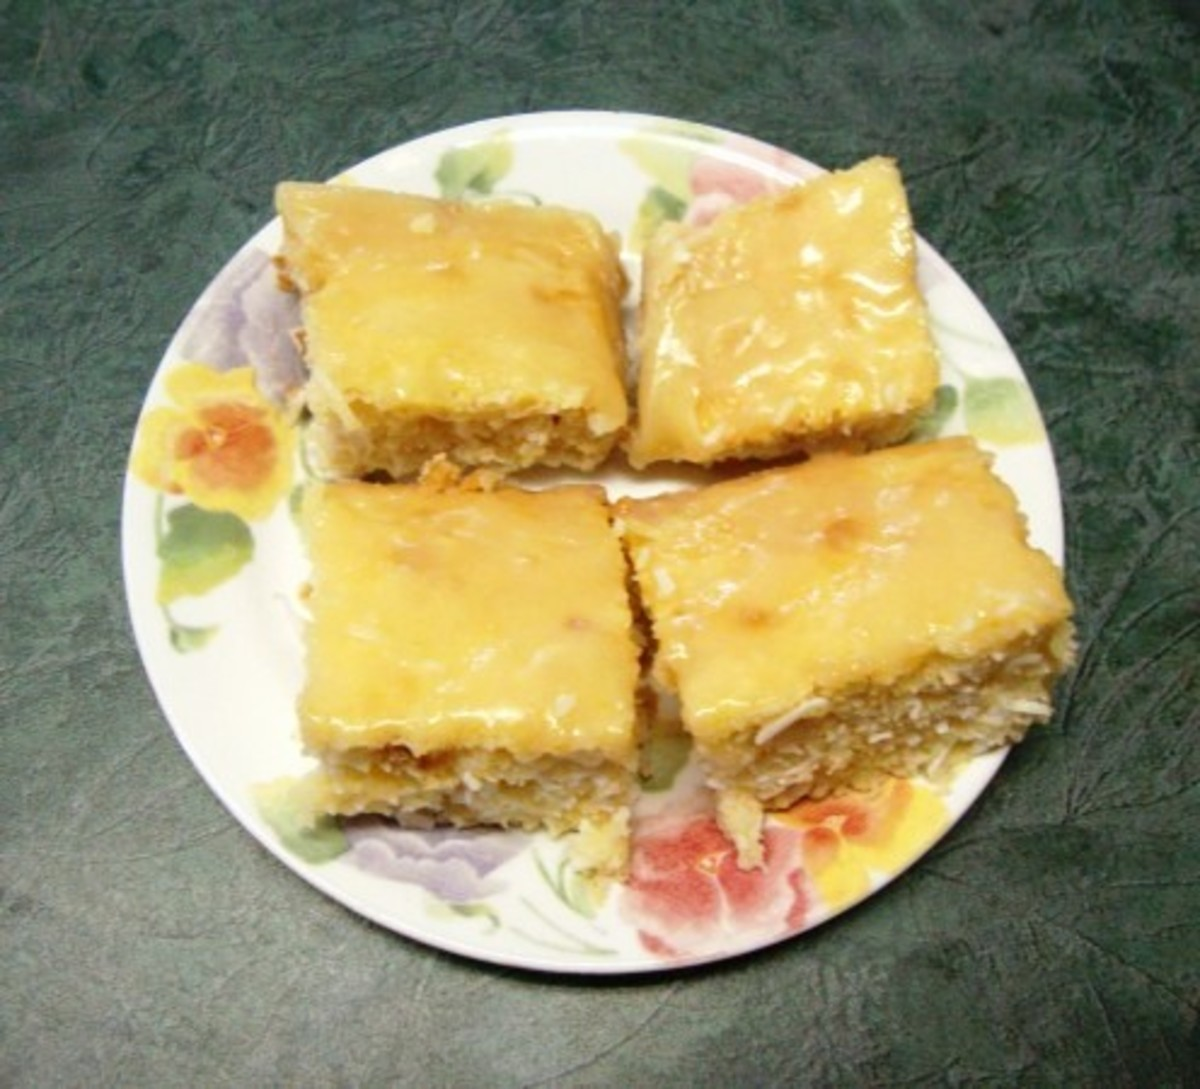 Glazed Pineapple-Coconut Cake